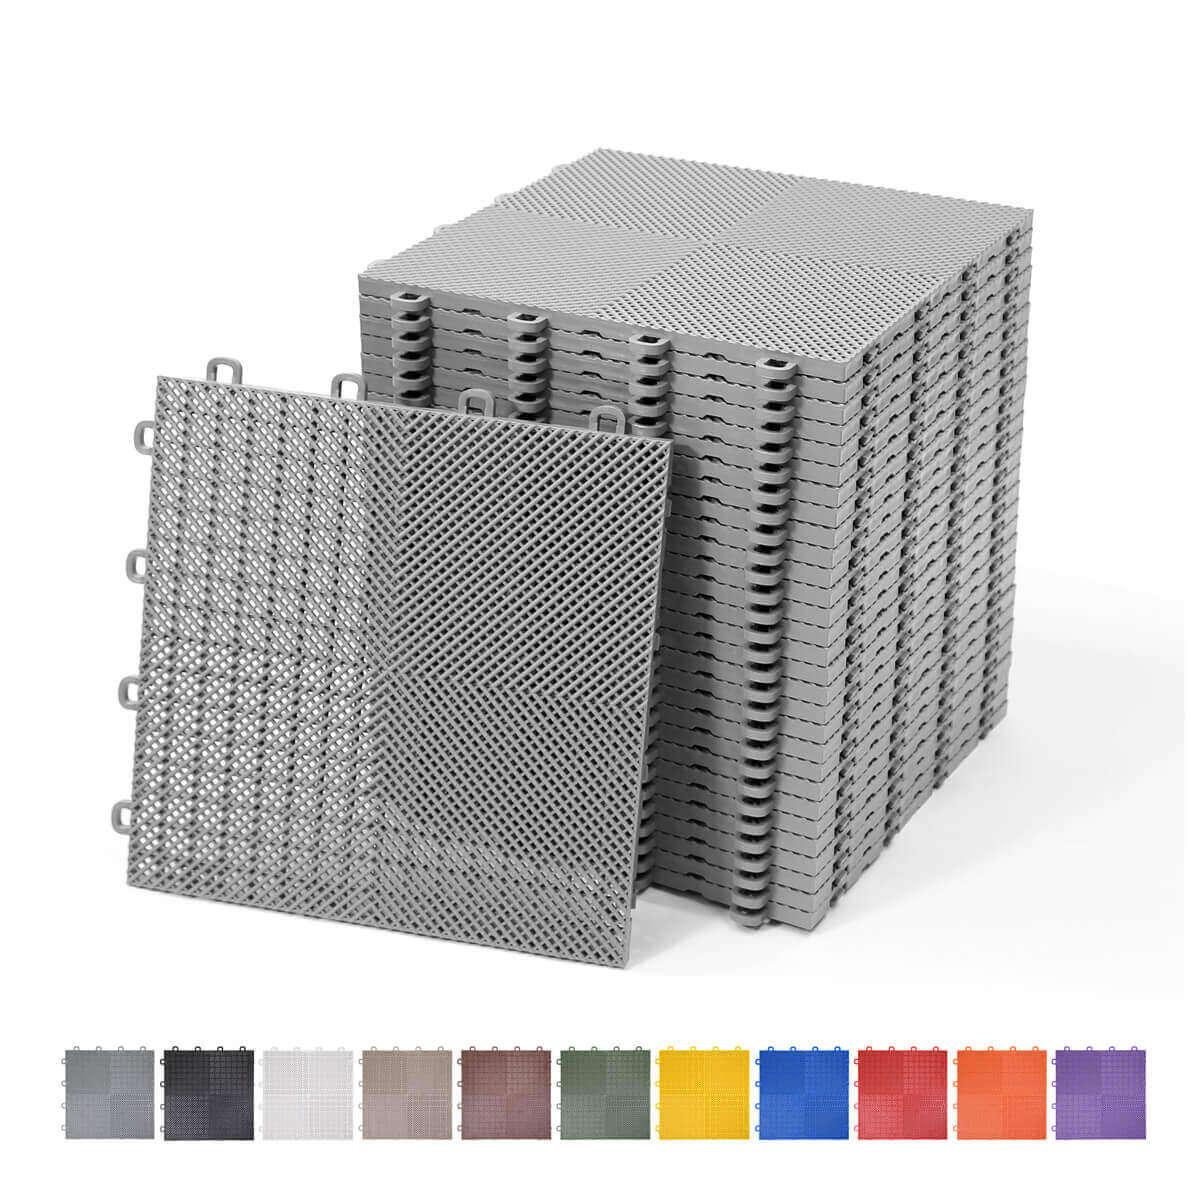 perforated interlocking floor tiles